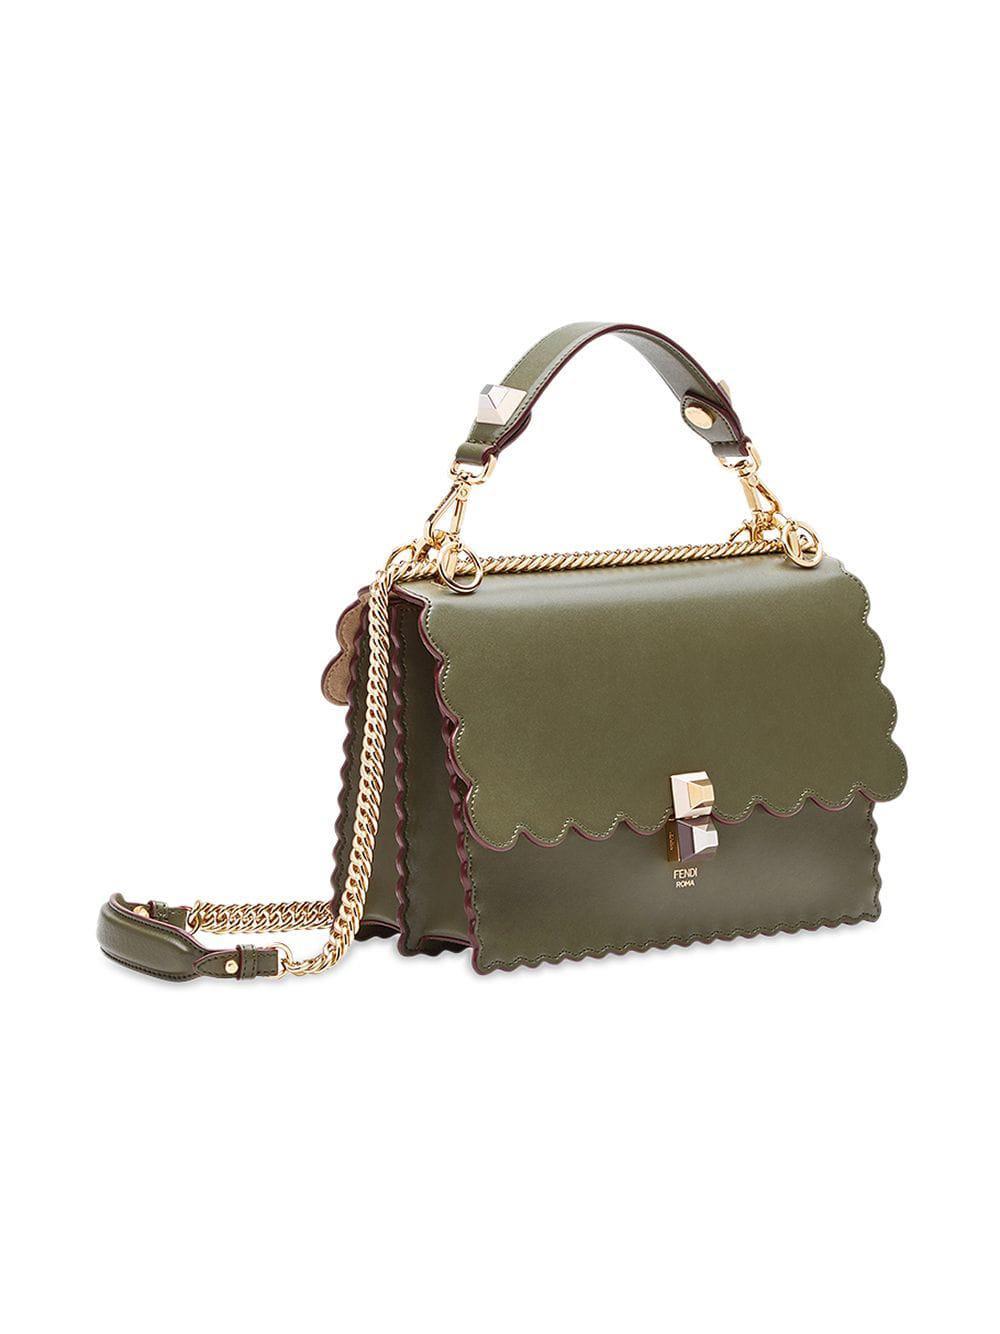 Fendi - Green Kan I Shoulder Bag - Lyst. View fullscreen 45e1c6b311381